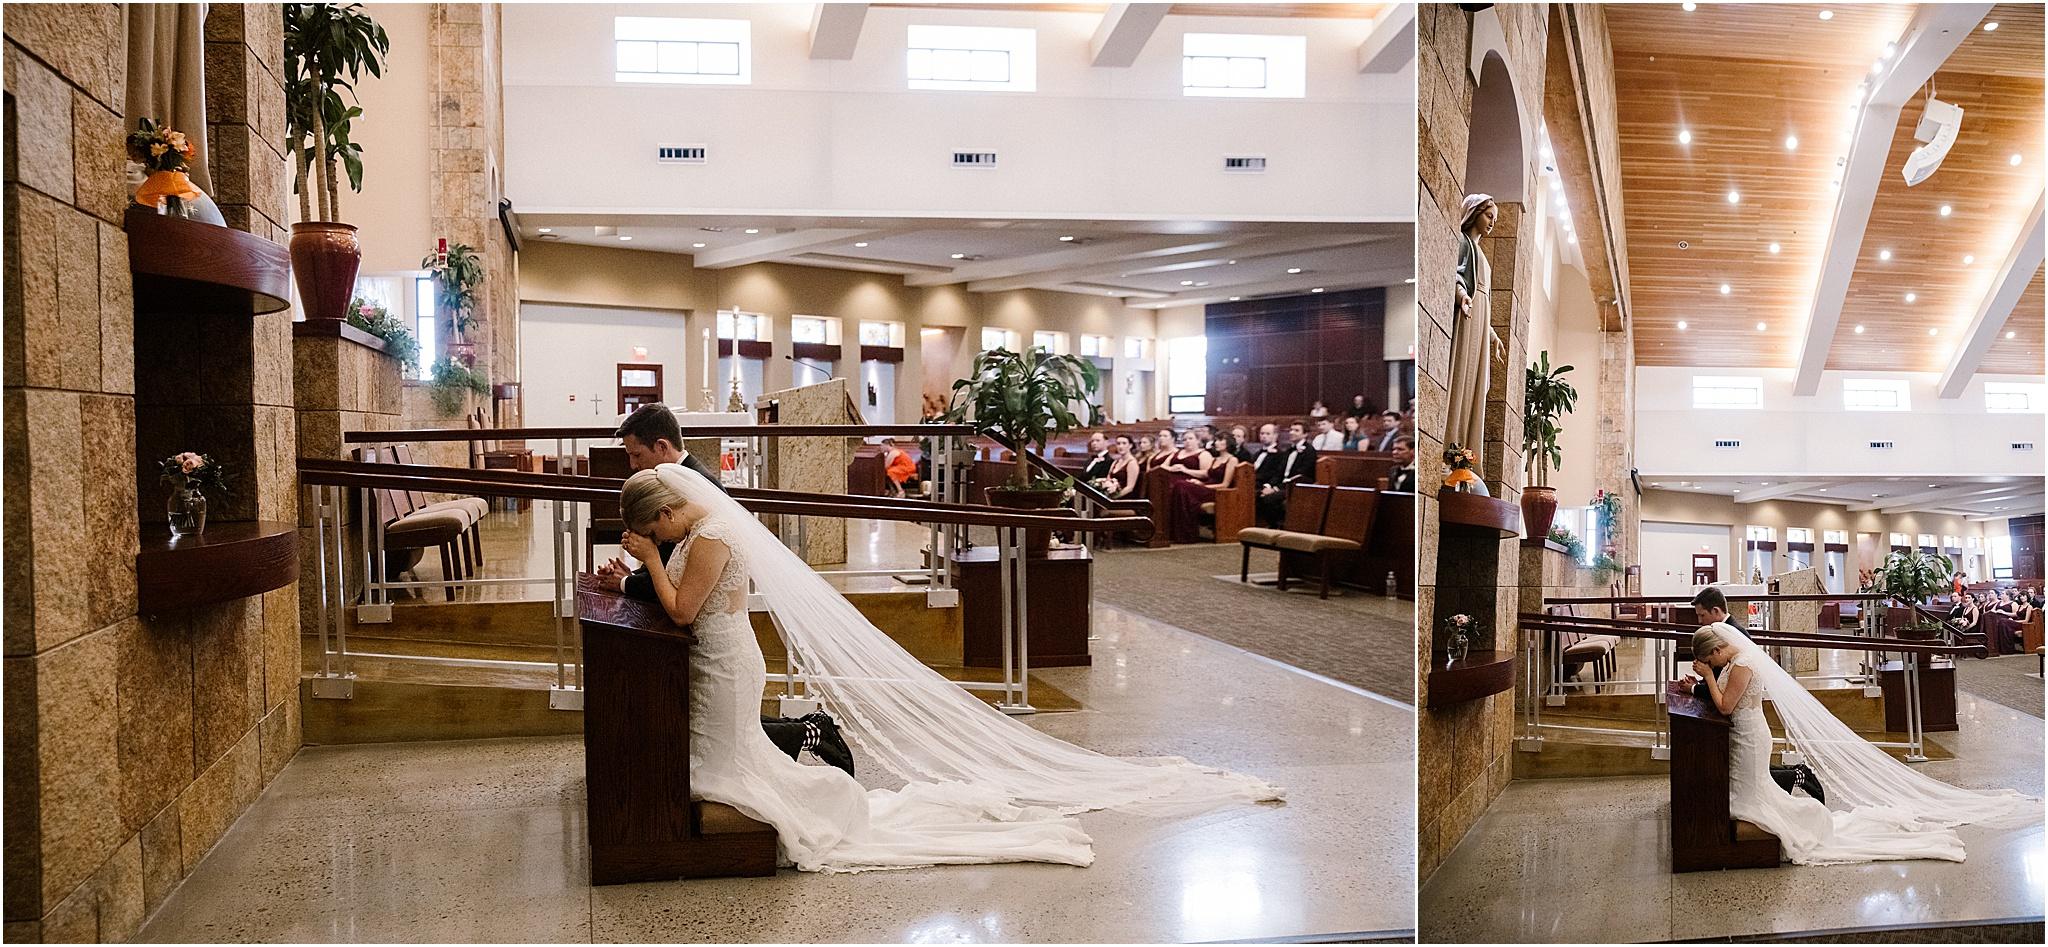 JENNA_JEROME_BLUE ROSE PHOTOGRAPHY_ABQ WEDDING_23